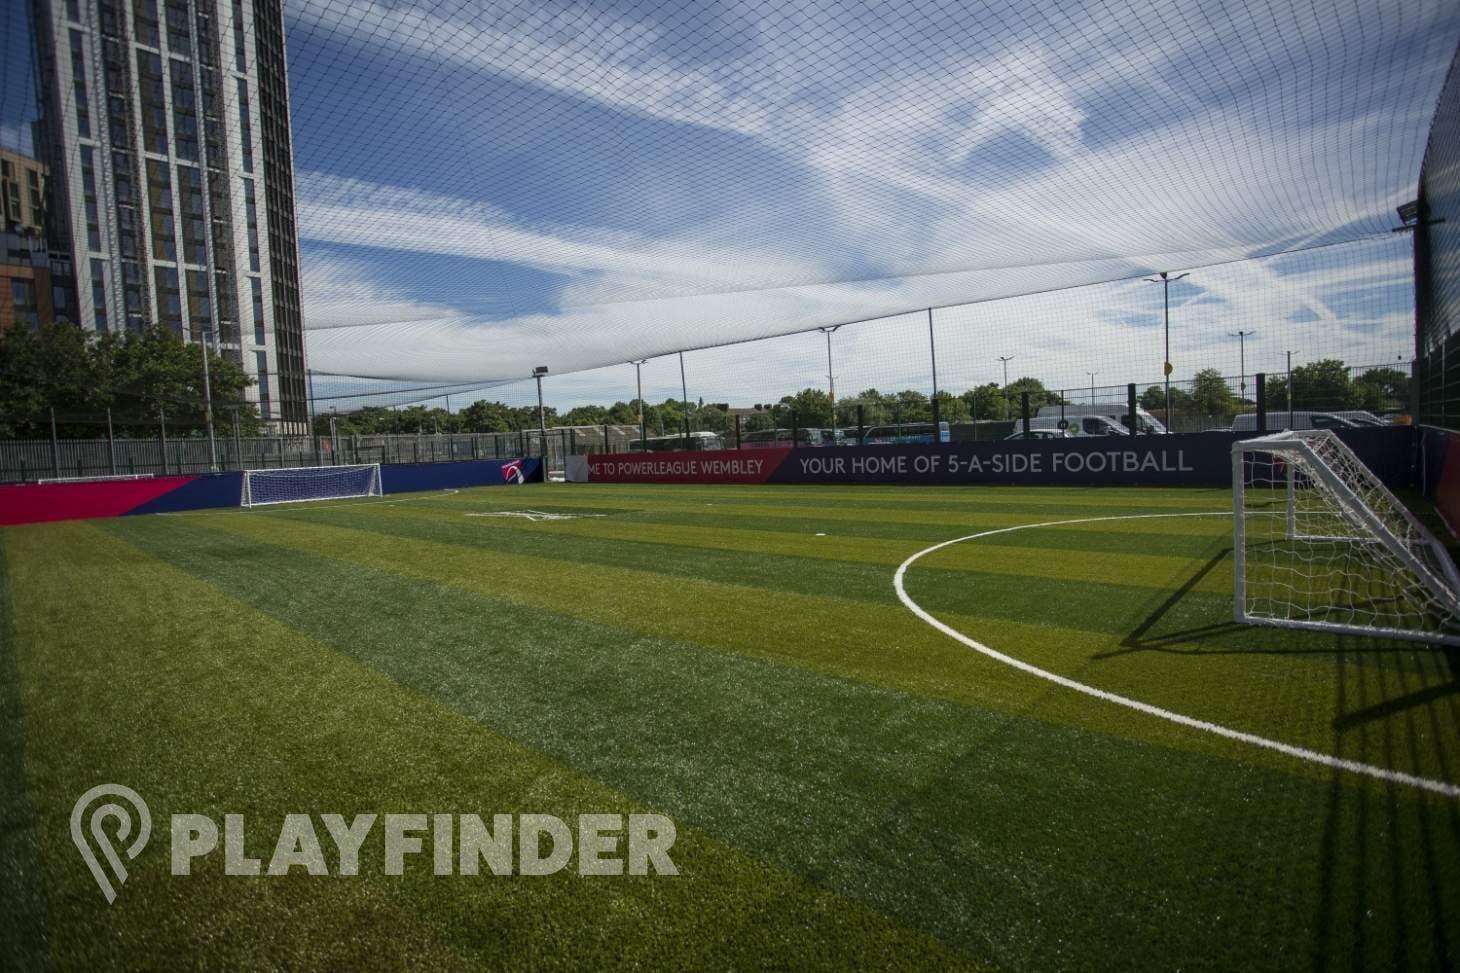 Powerleague Wembley 5 a side | 3G Astroturf football pitch